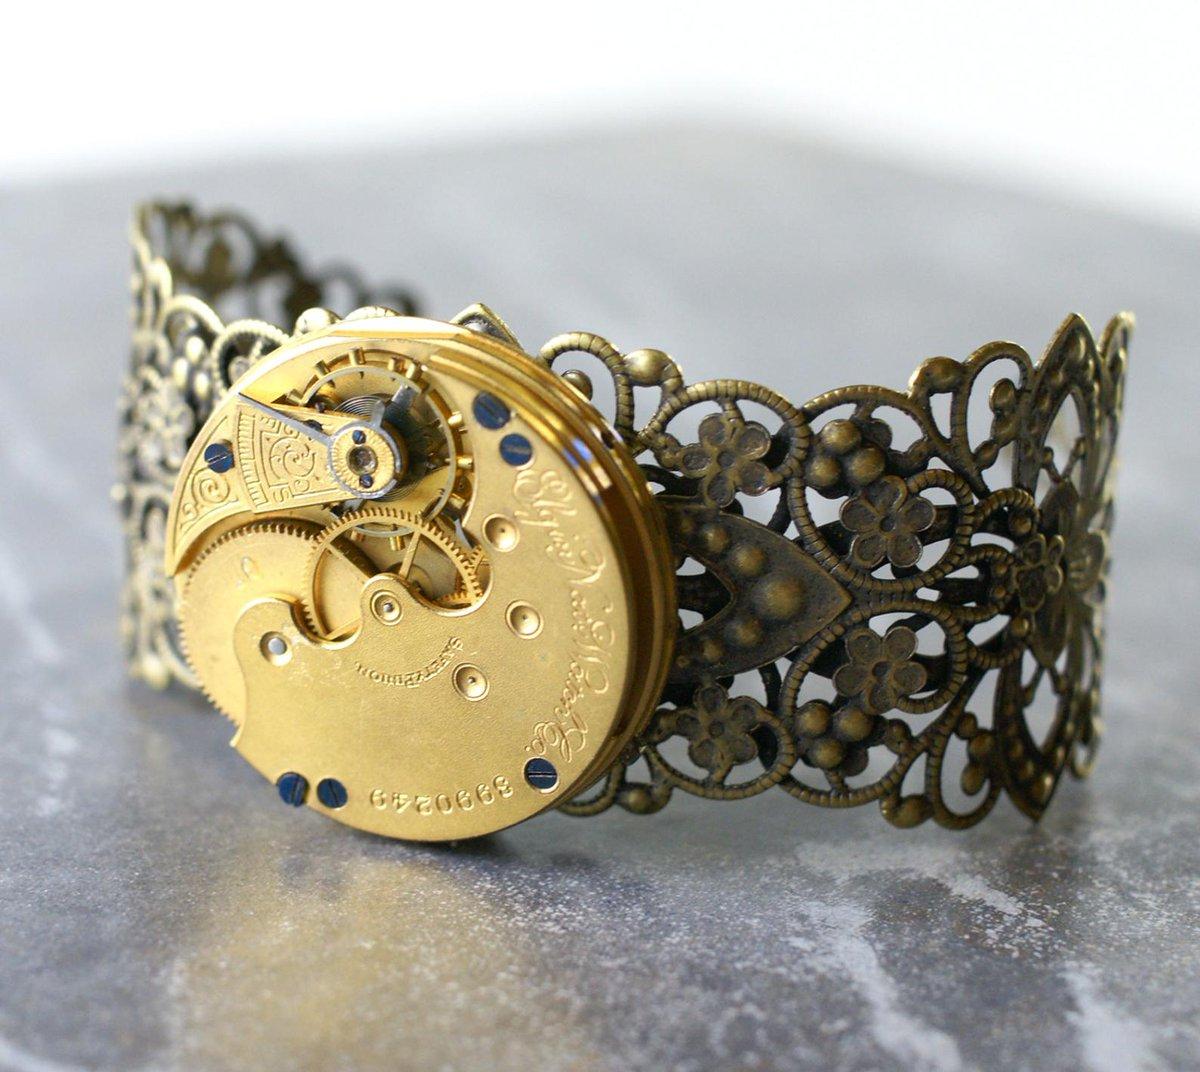 Steampunk Re-purposed Bracelet Vintage Pocket Watch Movement Jewelry Precious Metals Elgin National Wrist Adornment     #bracelet #steampunk #jewelry #watch #movement #Etsy #Gold #Metal #Precious #Jewels